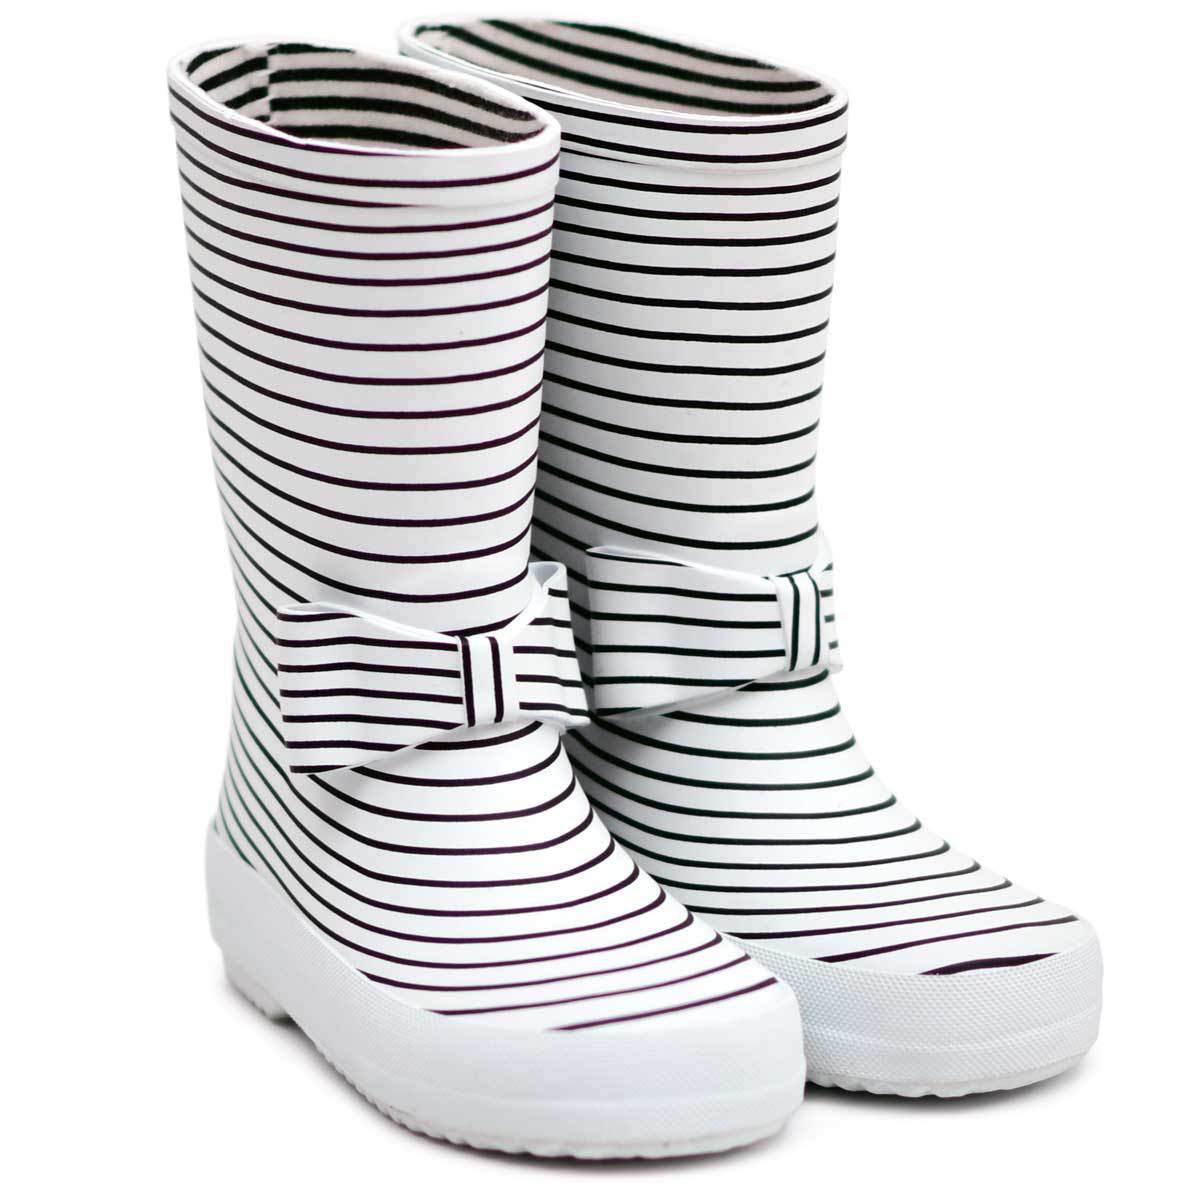 Chaussons & Chaussures Bottes Boxbonaute Bowtie - 26 Bottes Boxbonaute Bowtie - 26